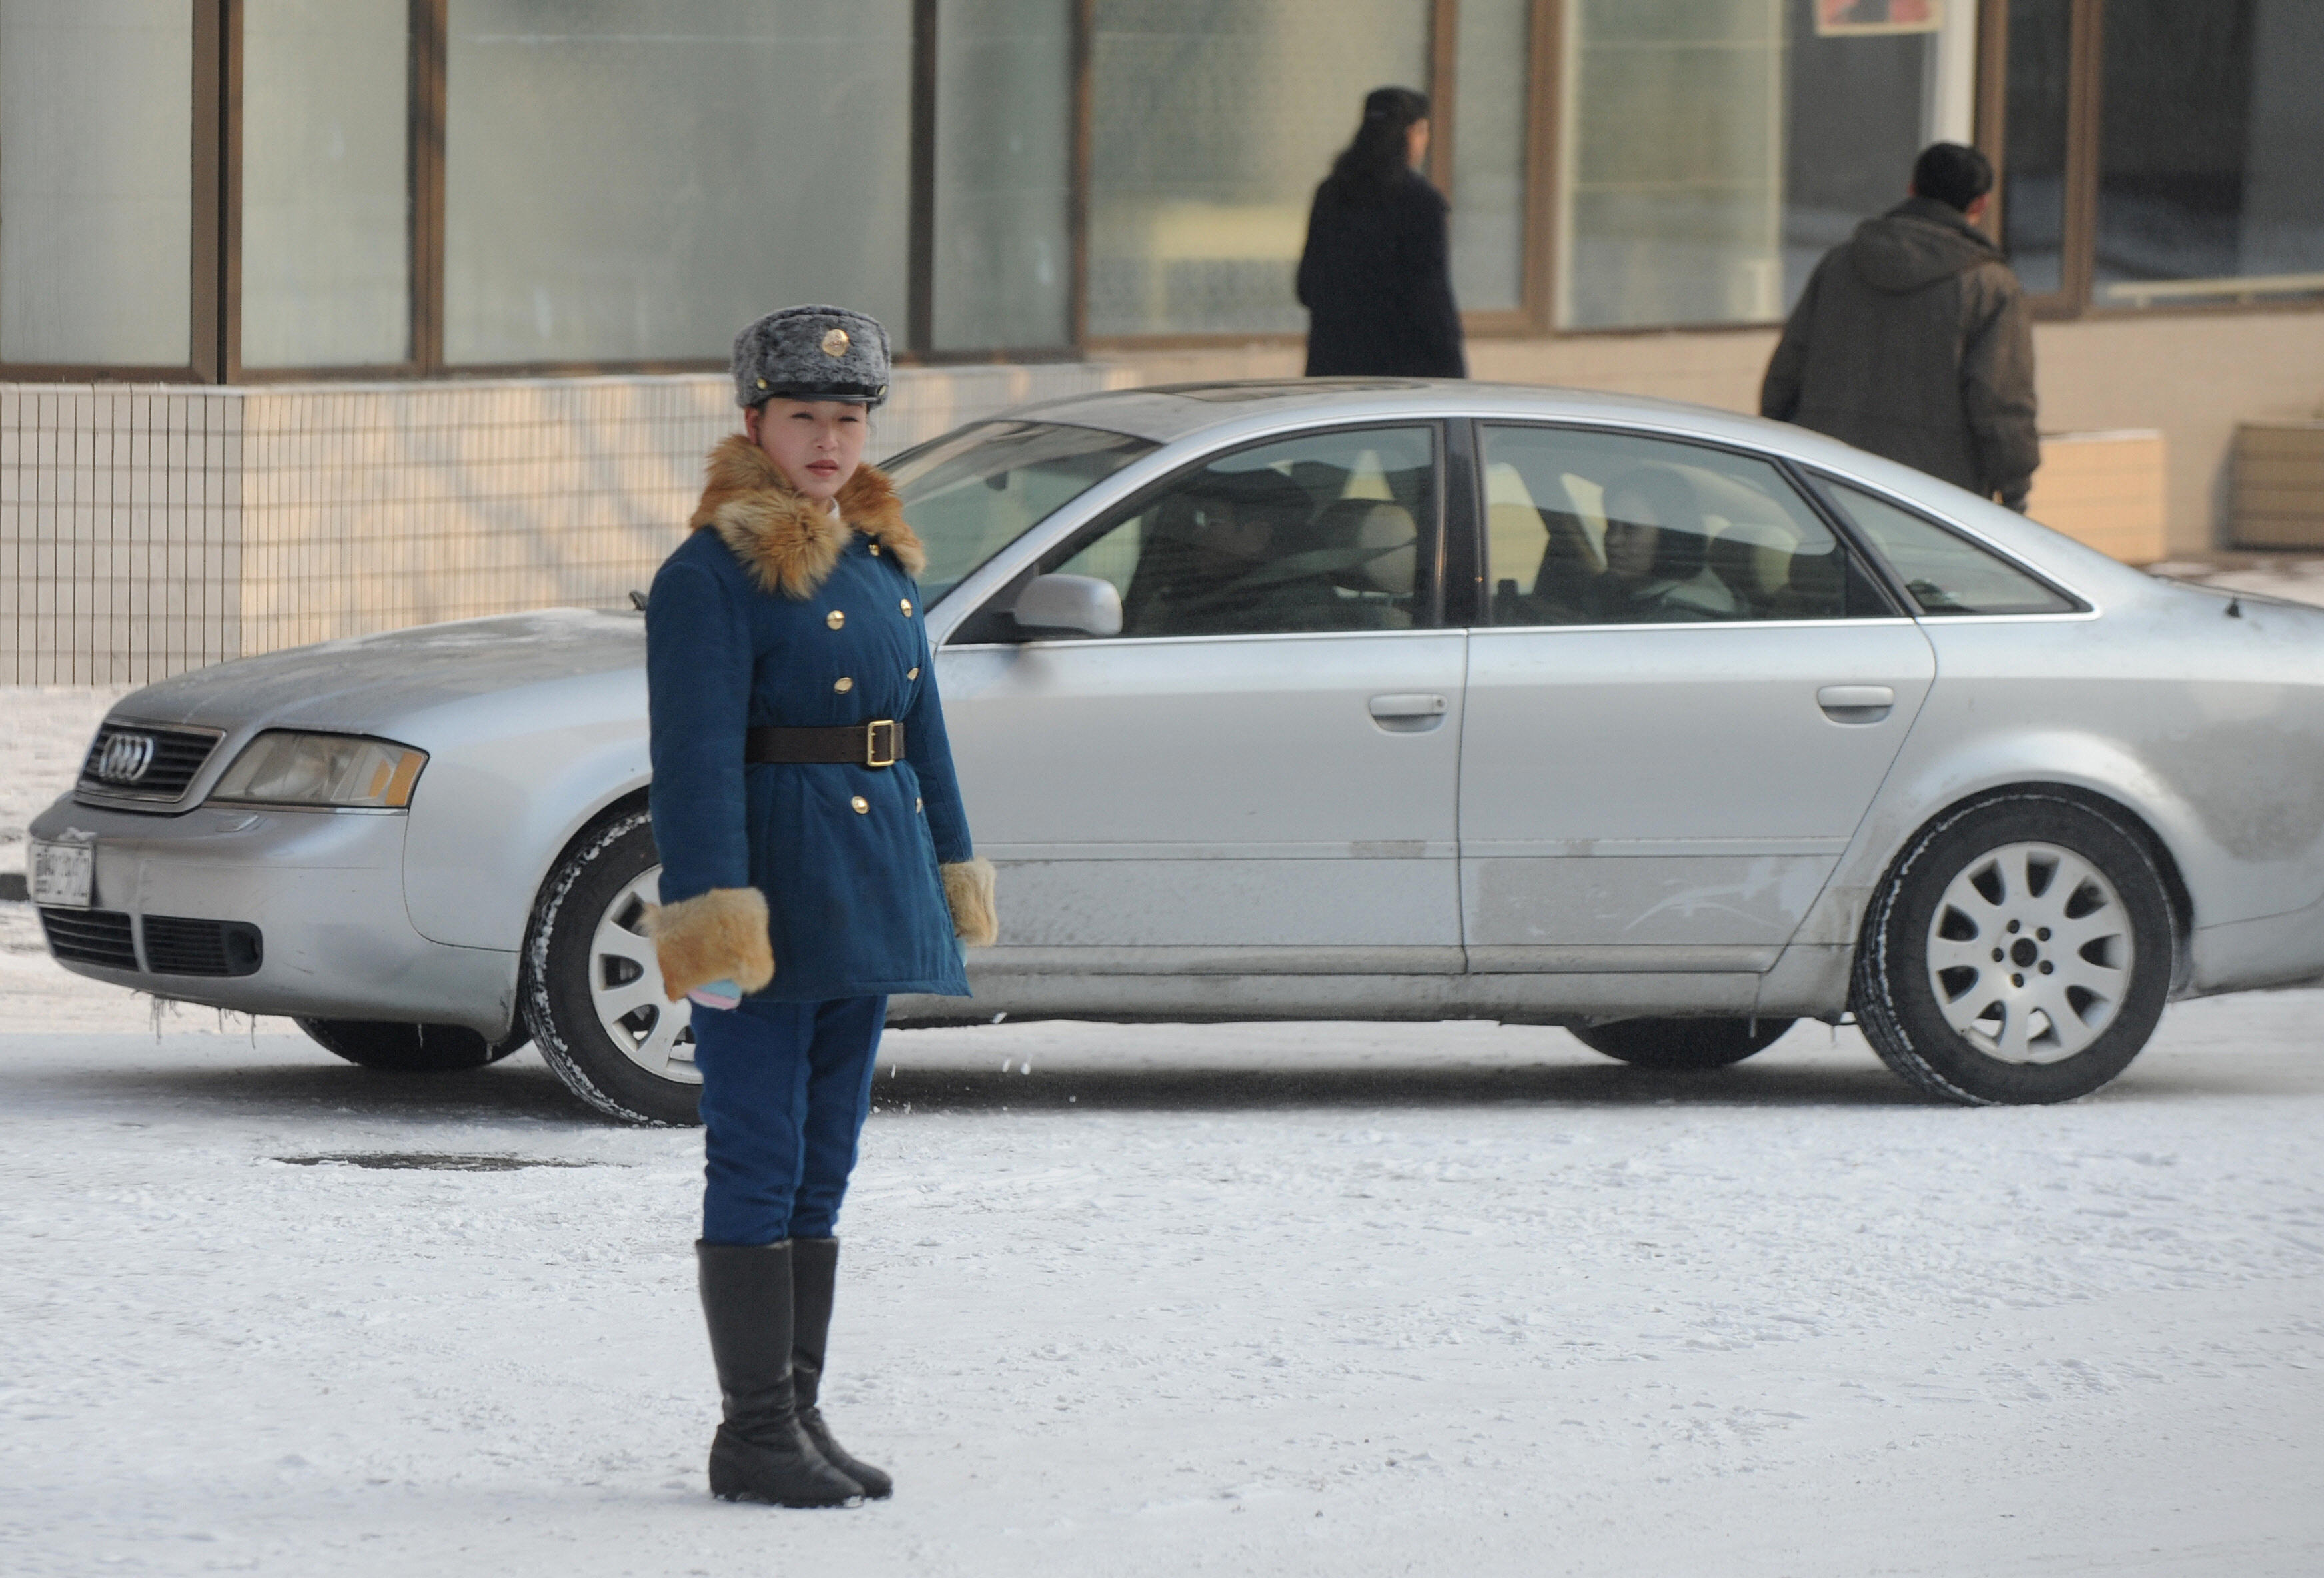 A North Korean traffic policewoman, dire